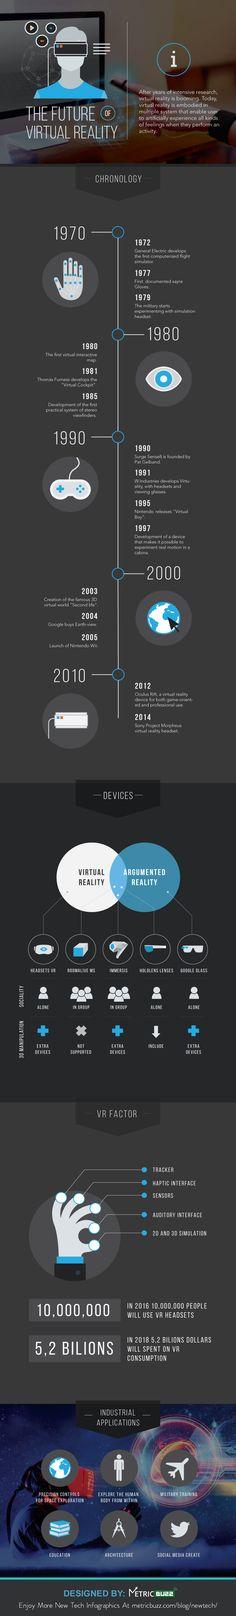 virtual reality history timeline